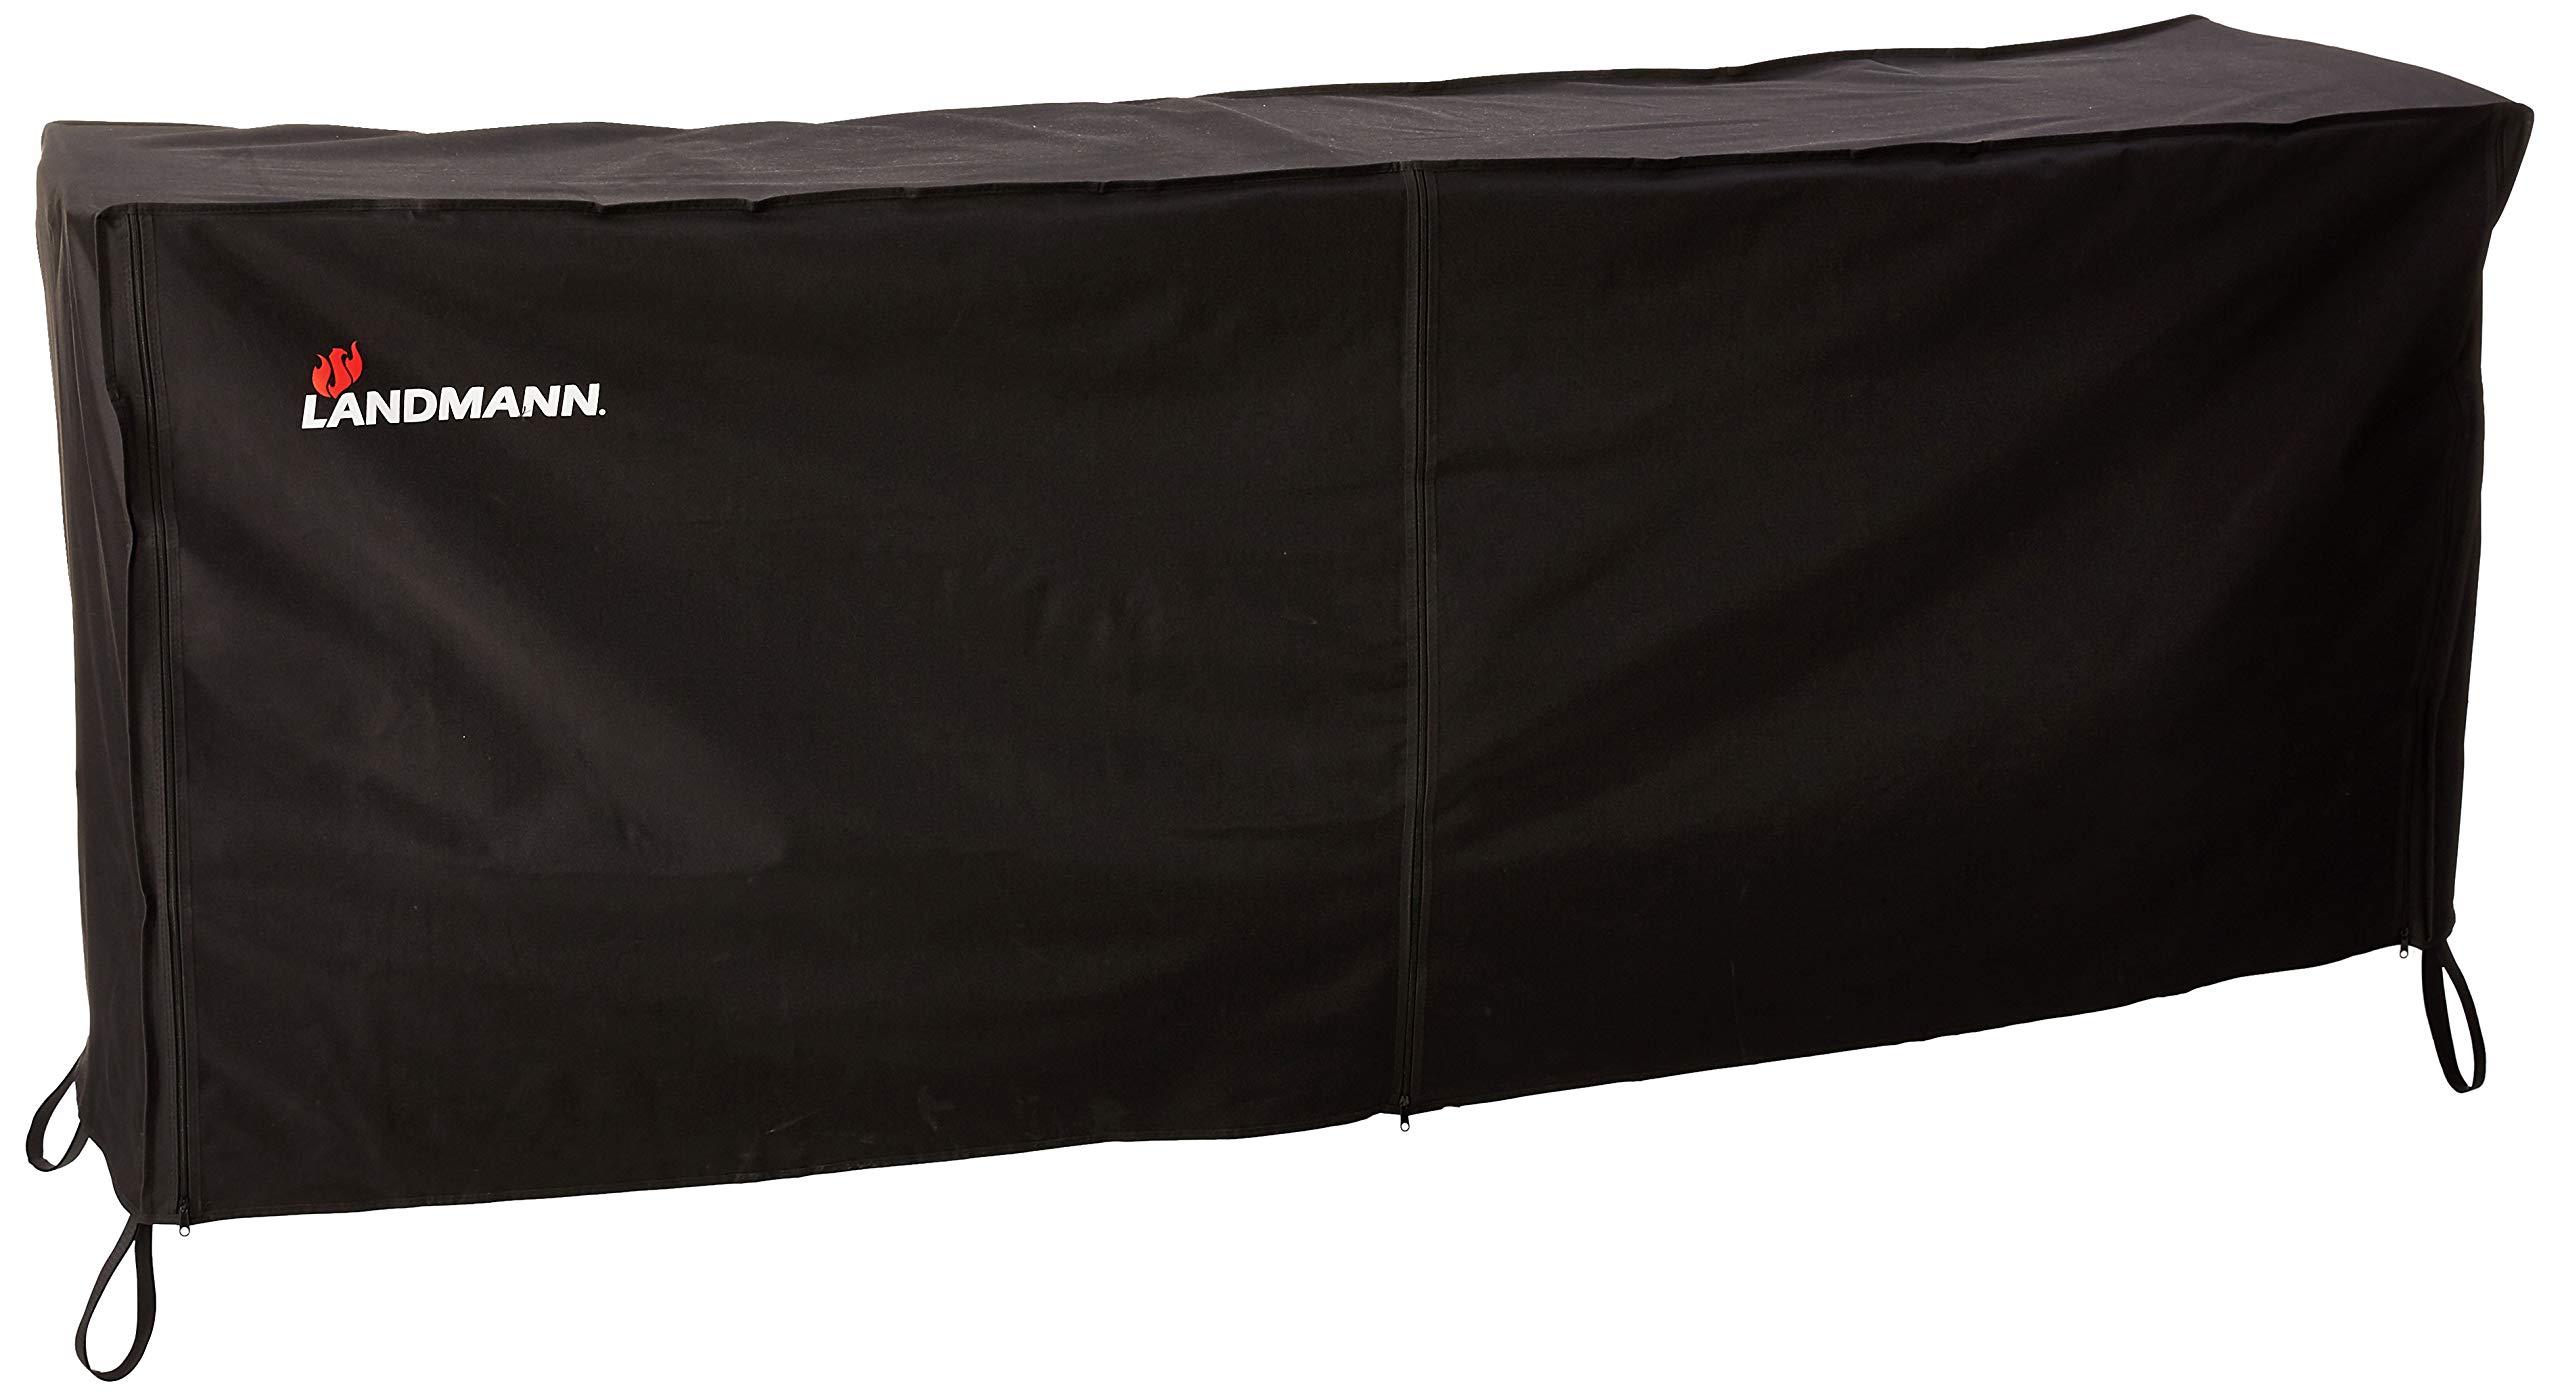 Landmann USA 82471 Heavy Duty Log Rack Cover, 8-Feet by Landmann